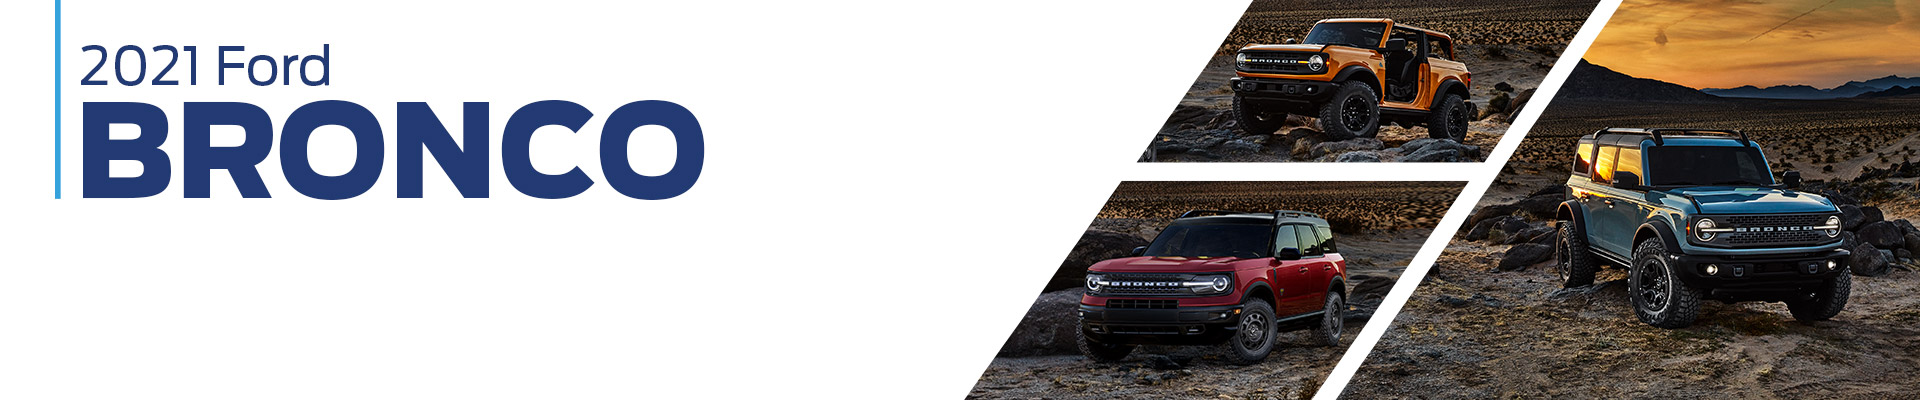 2021 Ford Bronco - Sun State Ford - Orlando, FL